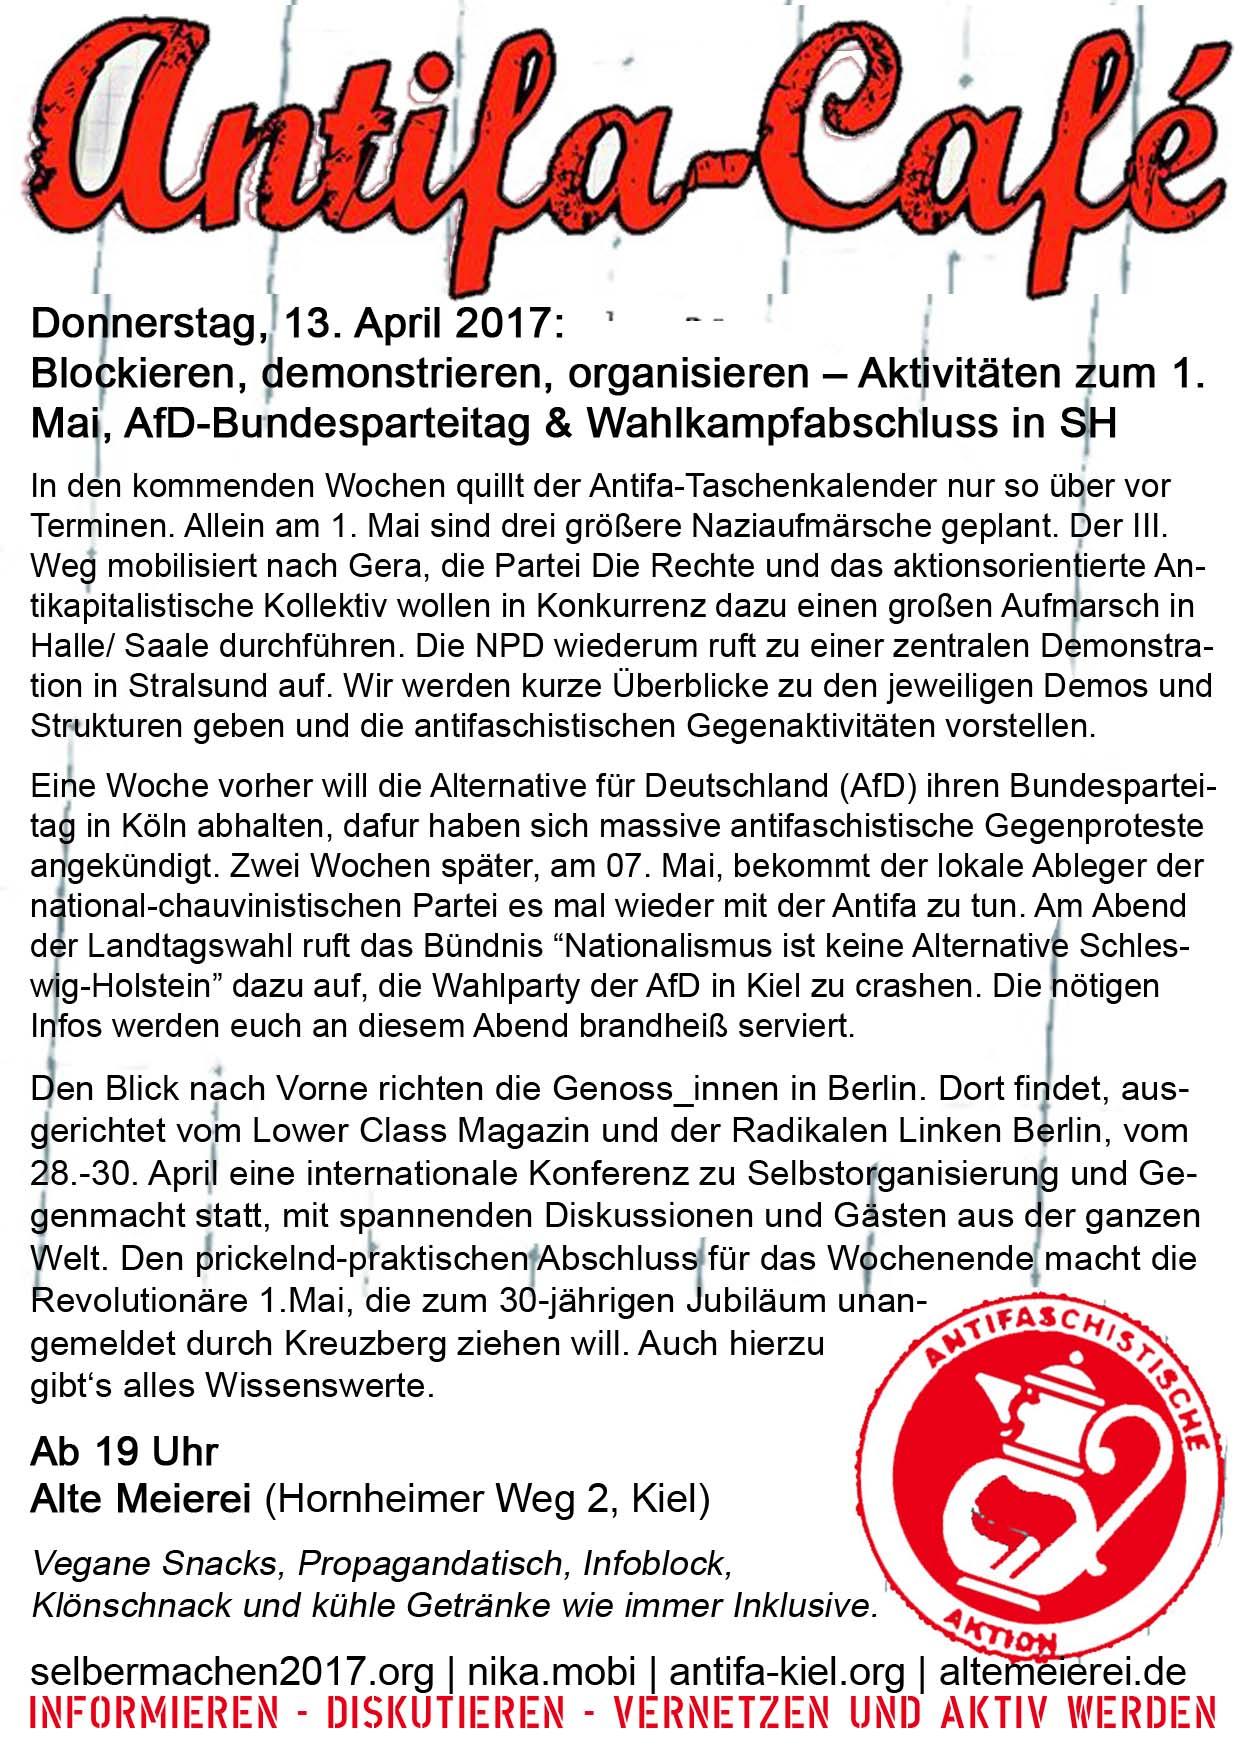 http://www.neu.antifa-kiel.org/wp-content/uploads/import/cafe_134.jpg